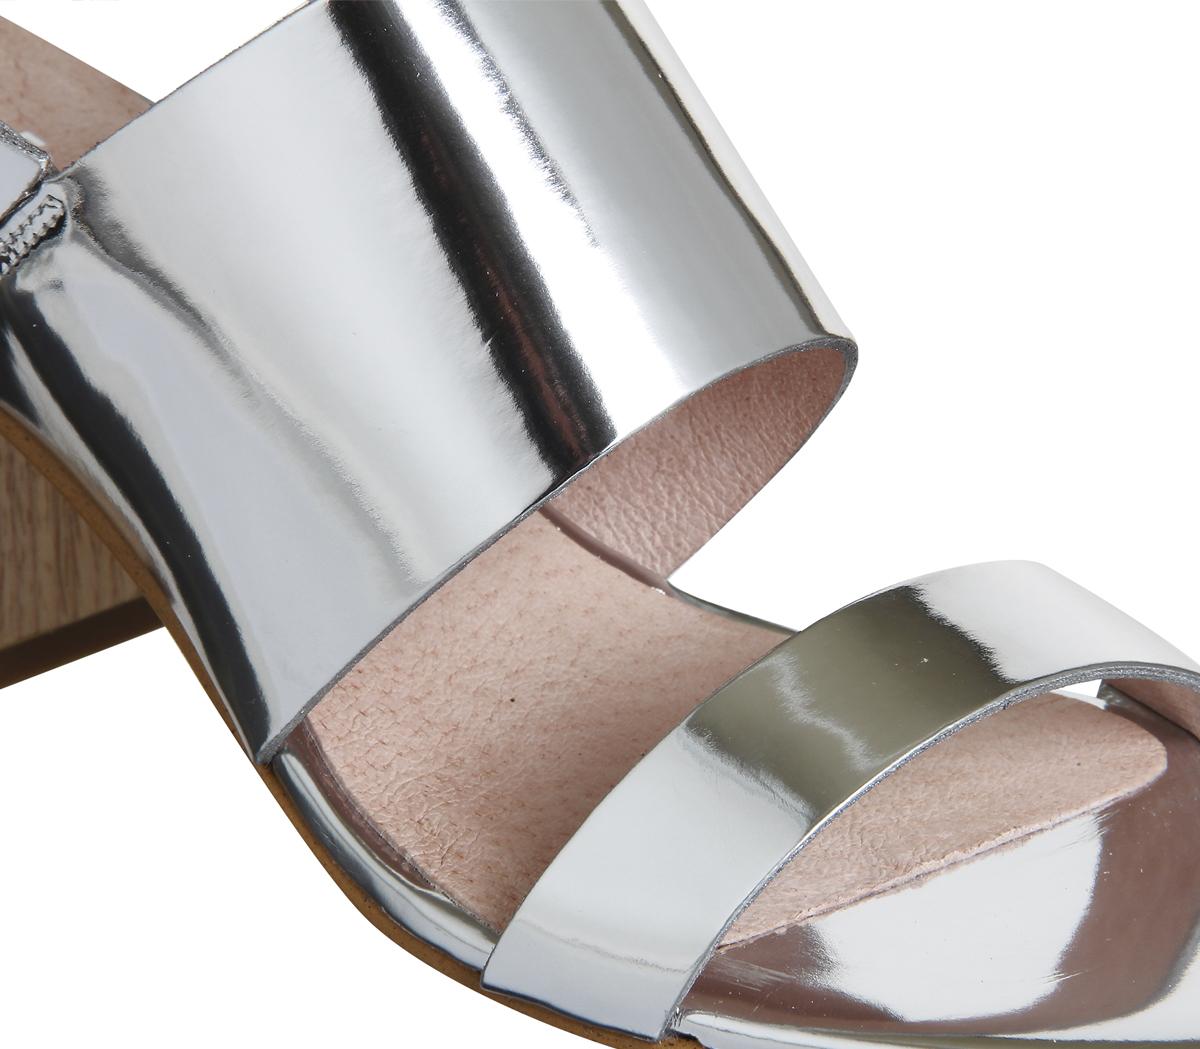 Damenschuhe Office Meadow Block Heel Heel Block Slingback Sandales Silver Mirror Heels 2a8179